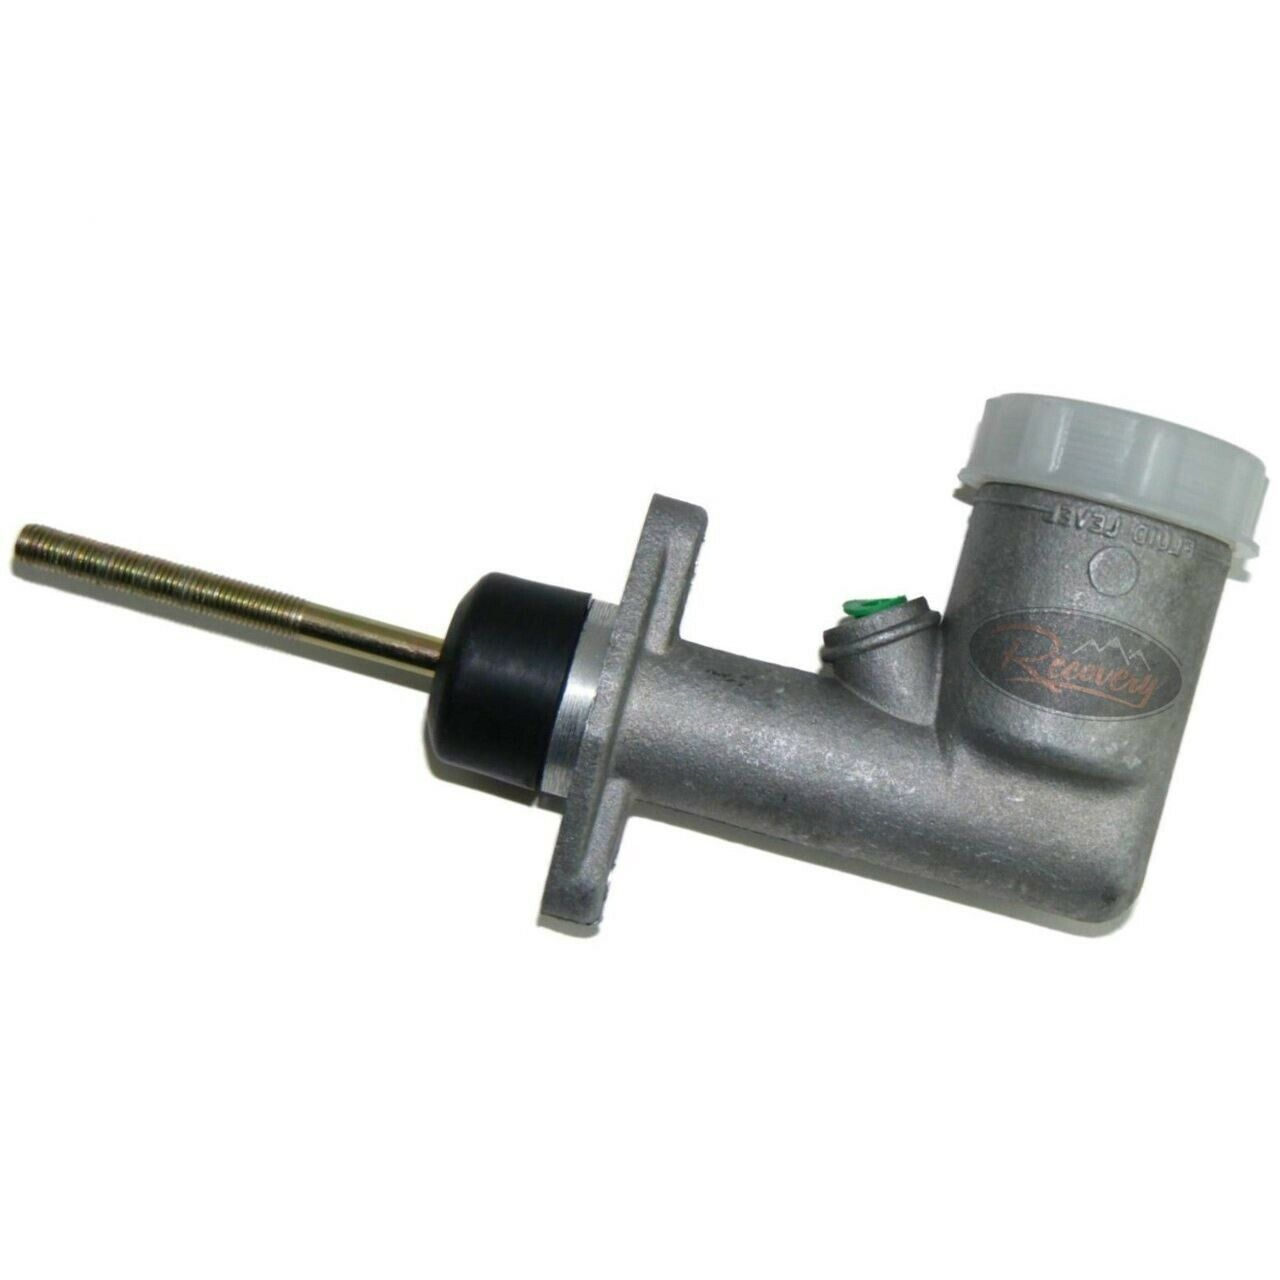 Allmakes 4x4 Land Rover Defender Clutch Master Cylinder STC500100